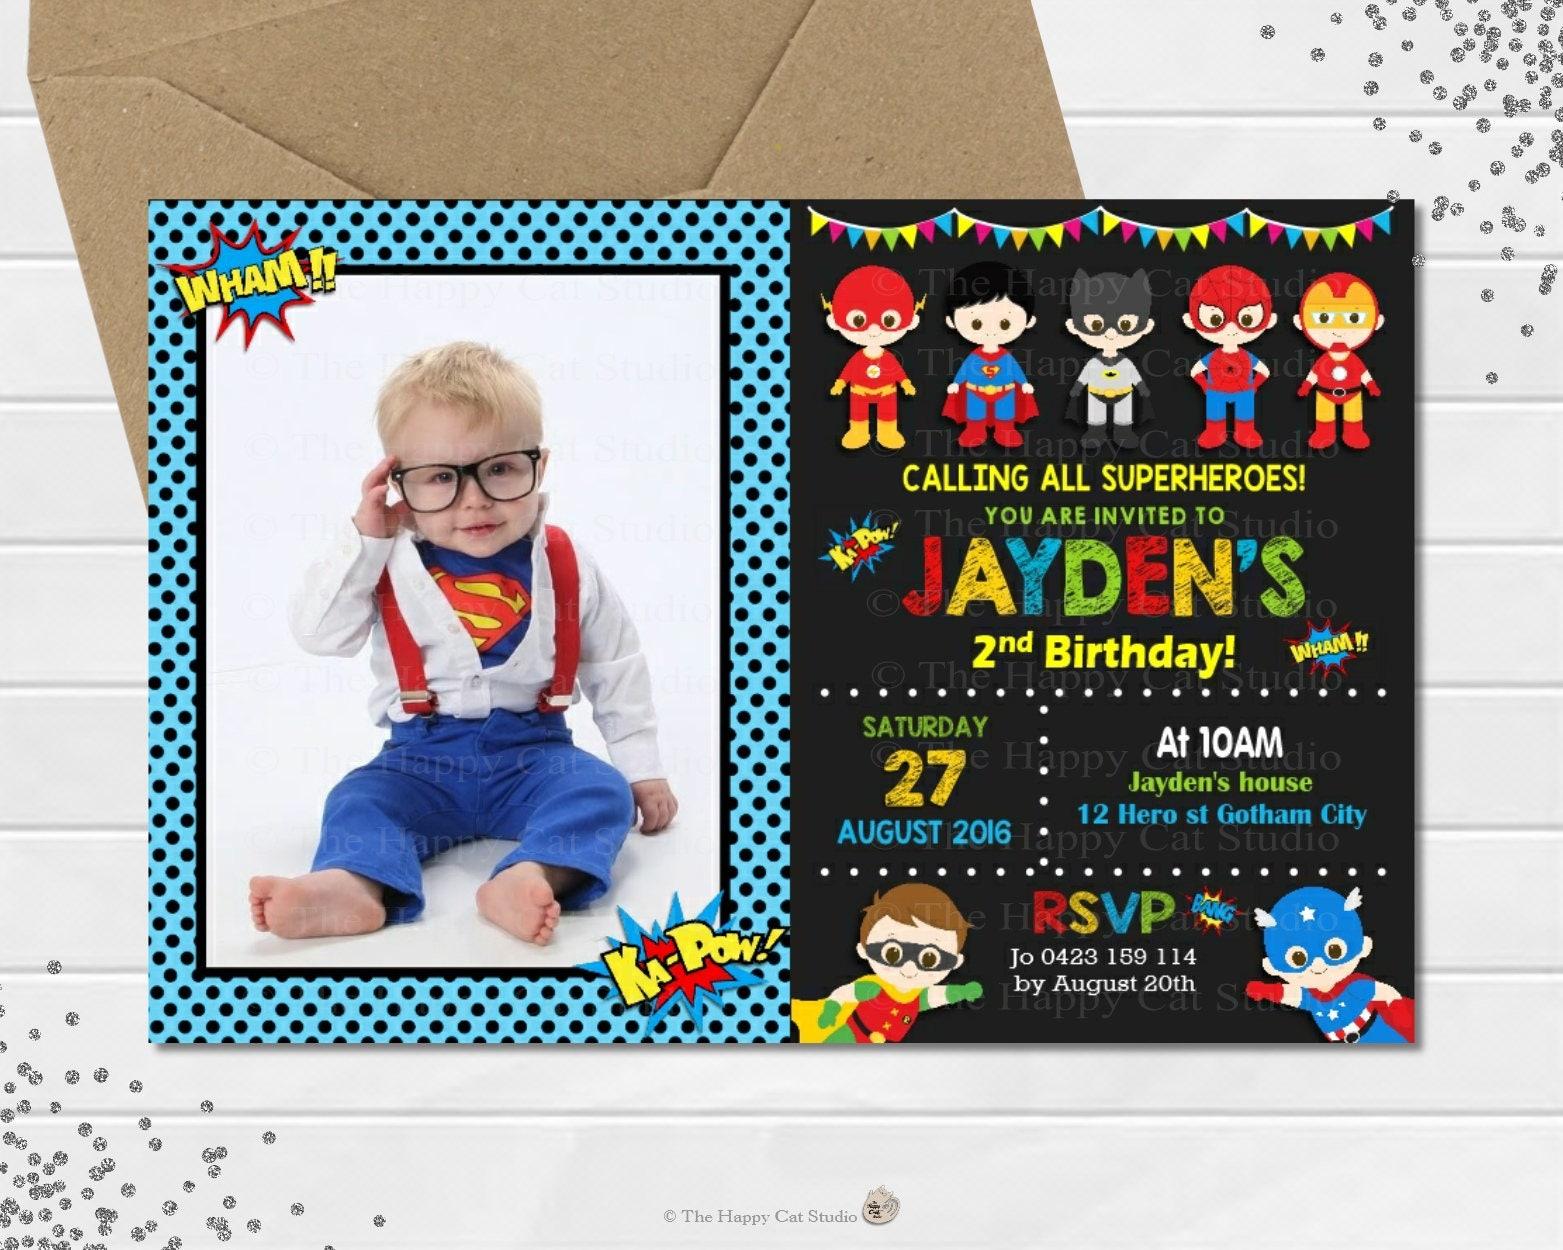 invites Boys Girls Kids 12 Superhero Personalised Party Birthday Invitations